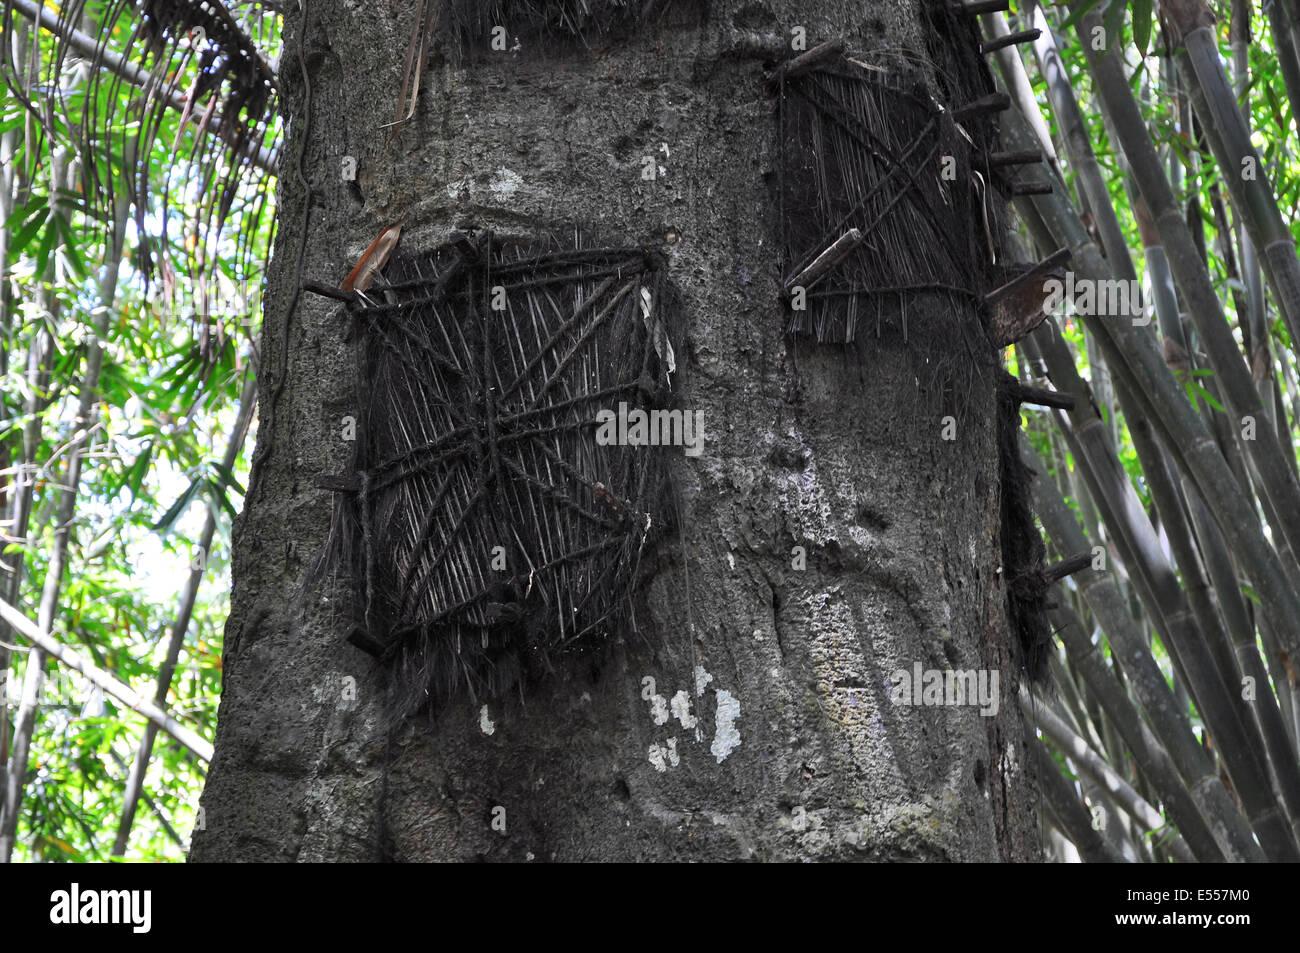 Tree graves for babies, Sangalla, Tana Toraja, Sulawesi, Indonesia - Stock Image